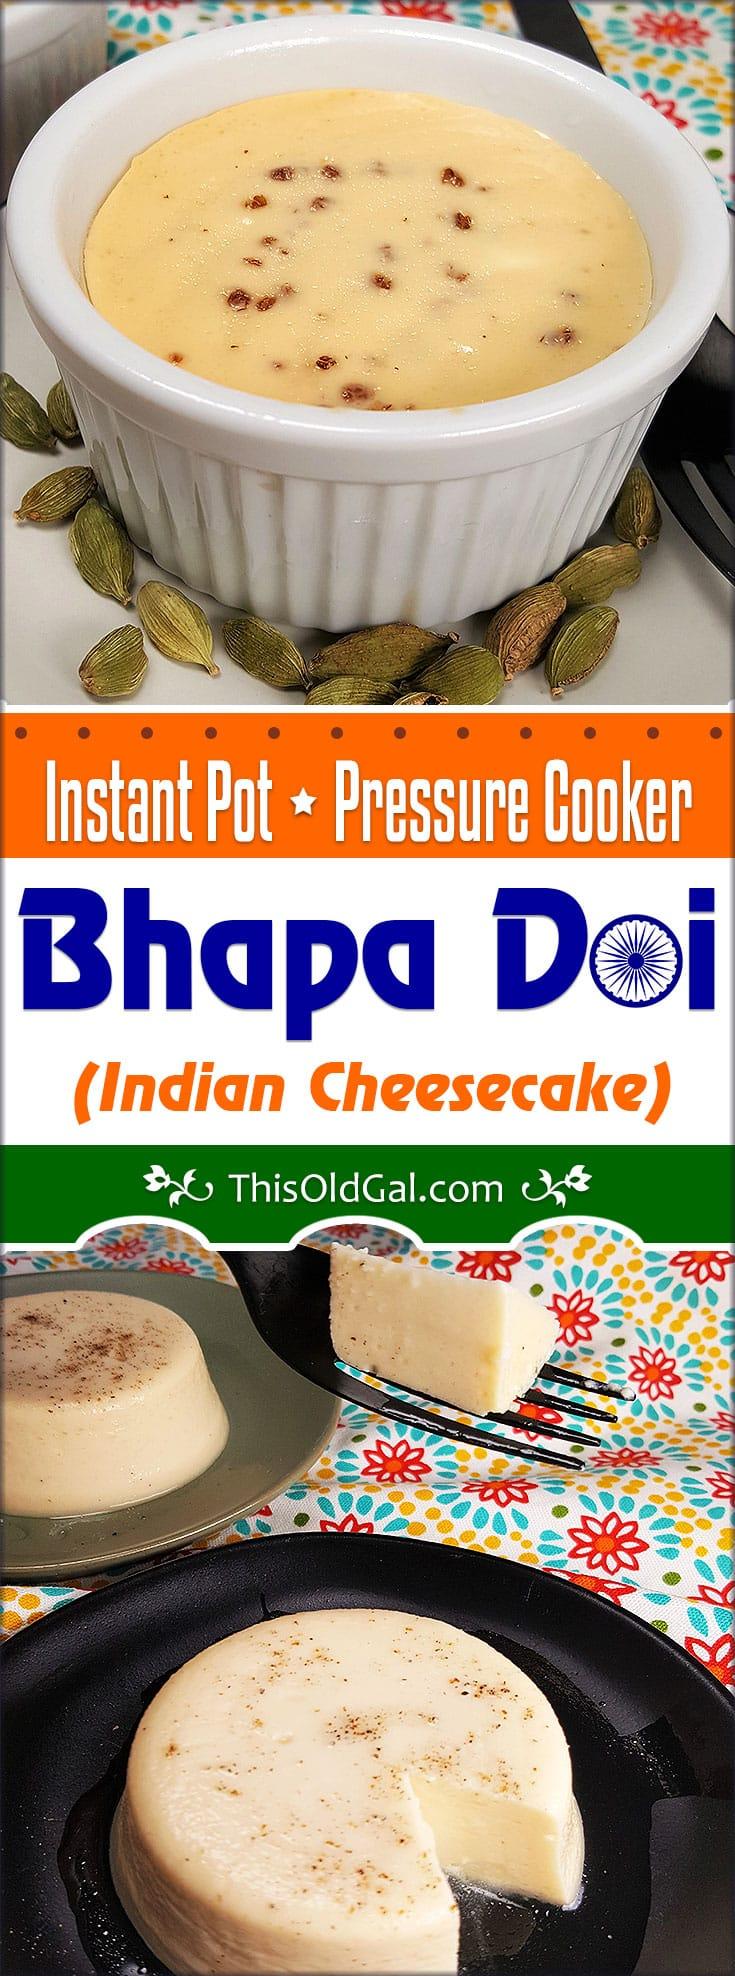 Pressure Cooker Bhapa Doi Steamed Yogurt Pudding/Cheesecake